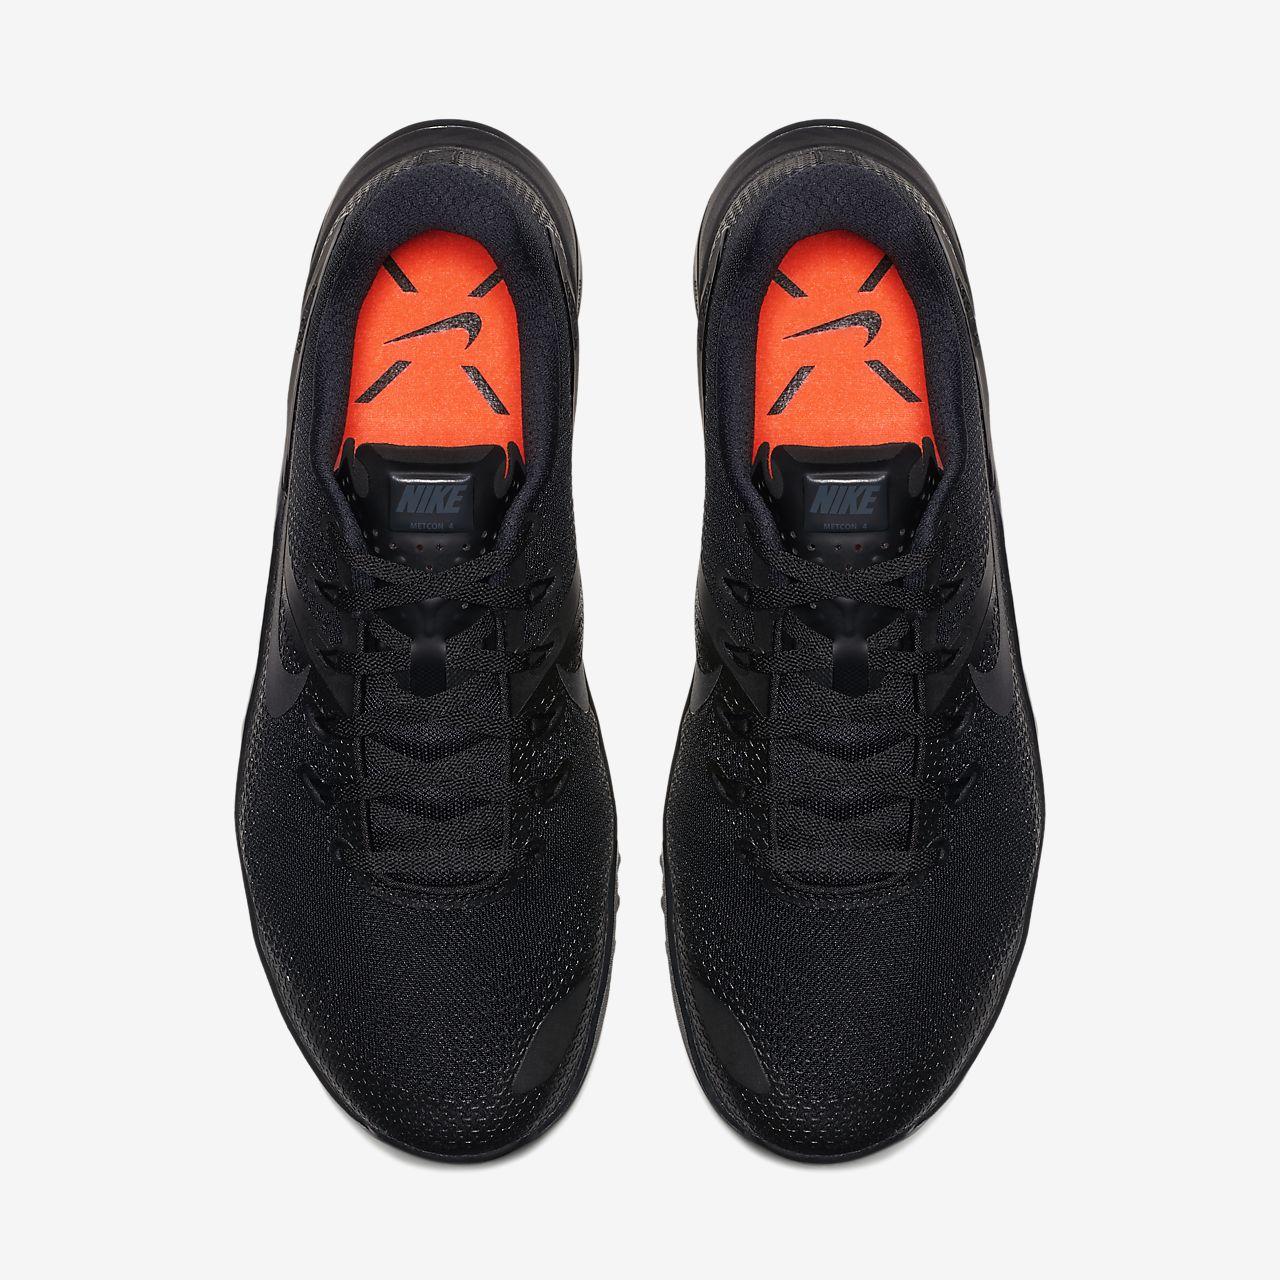 Nike Metcon 4 Men's Cross TrainingWeightlifting Shoe. Nike NL